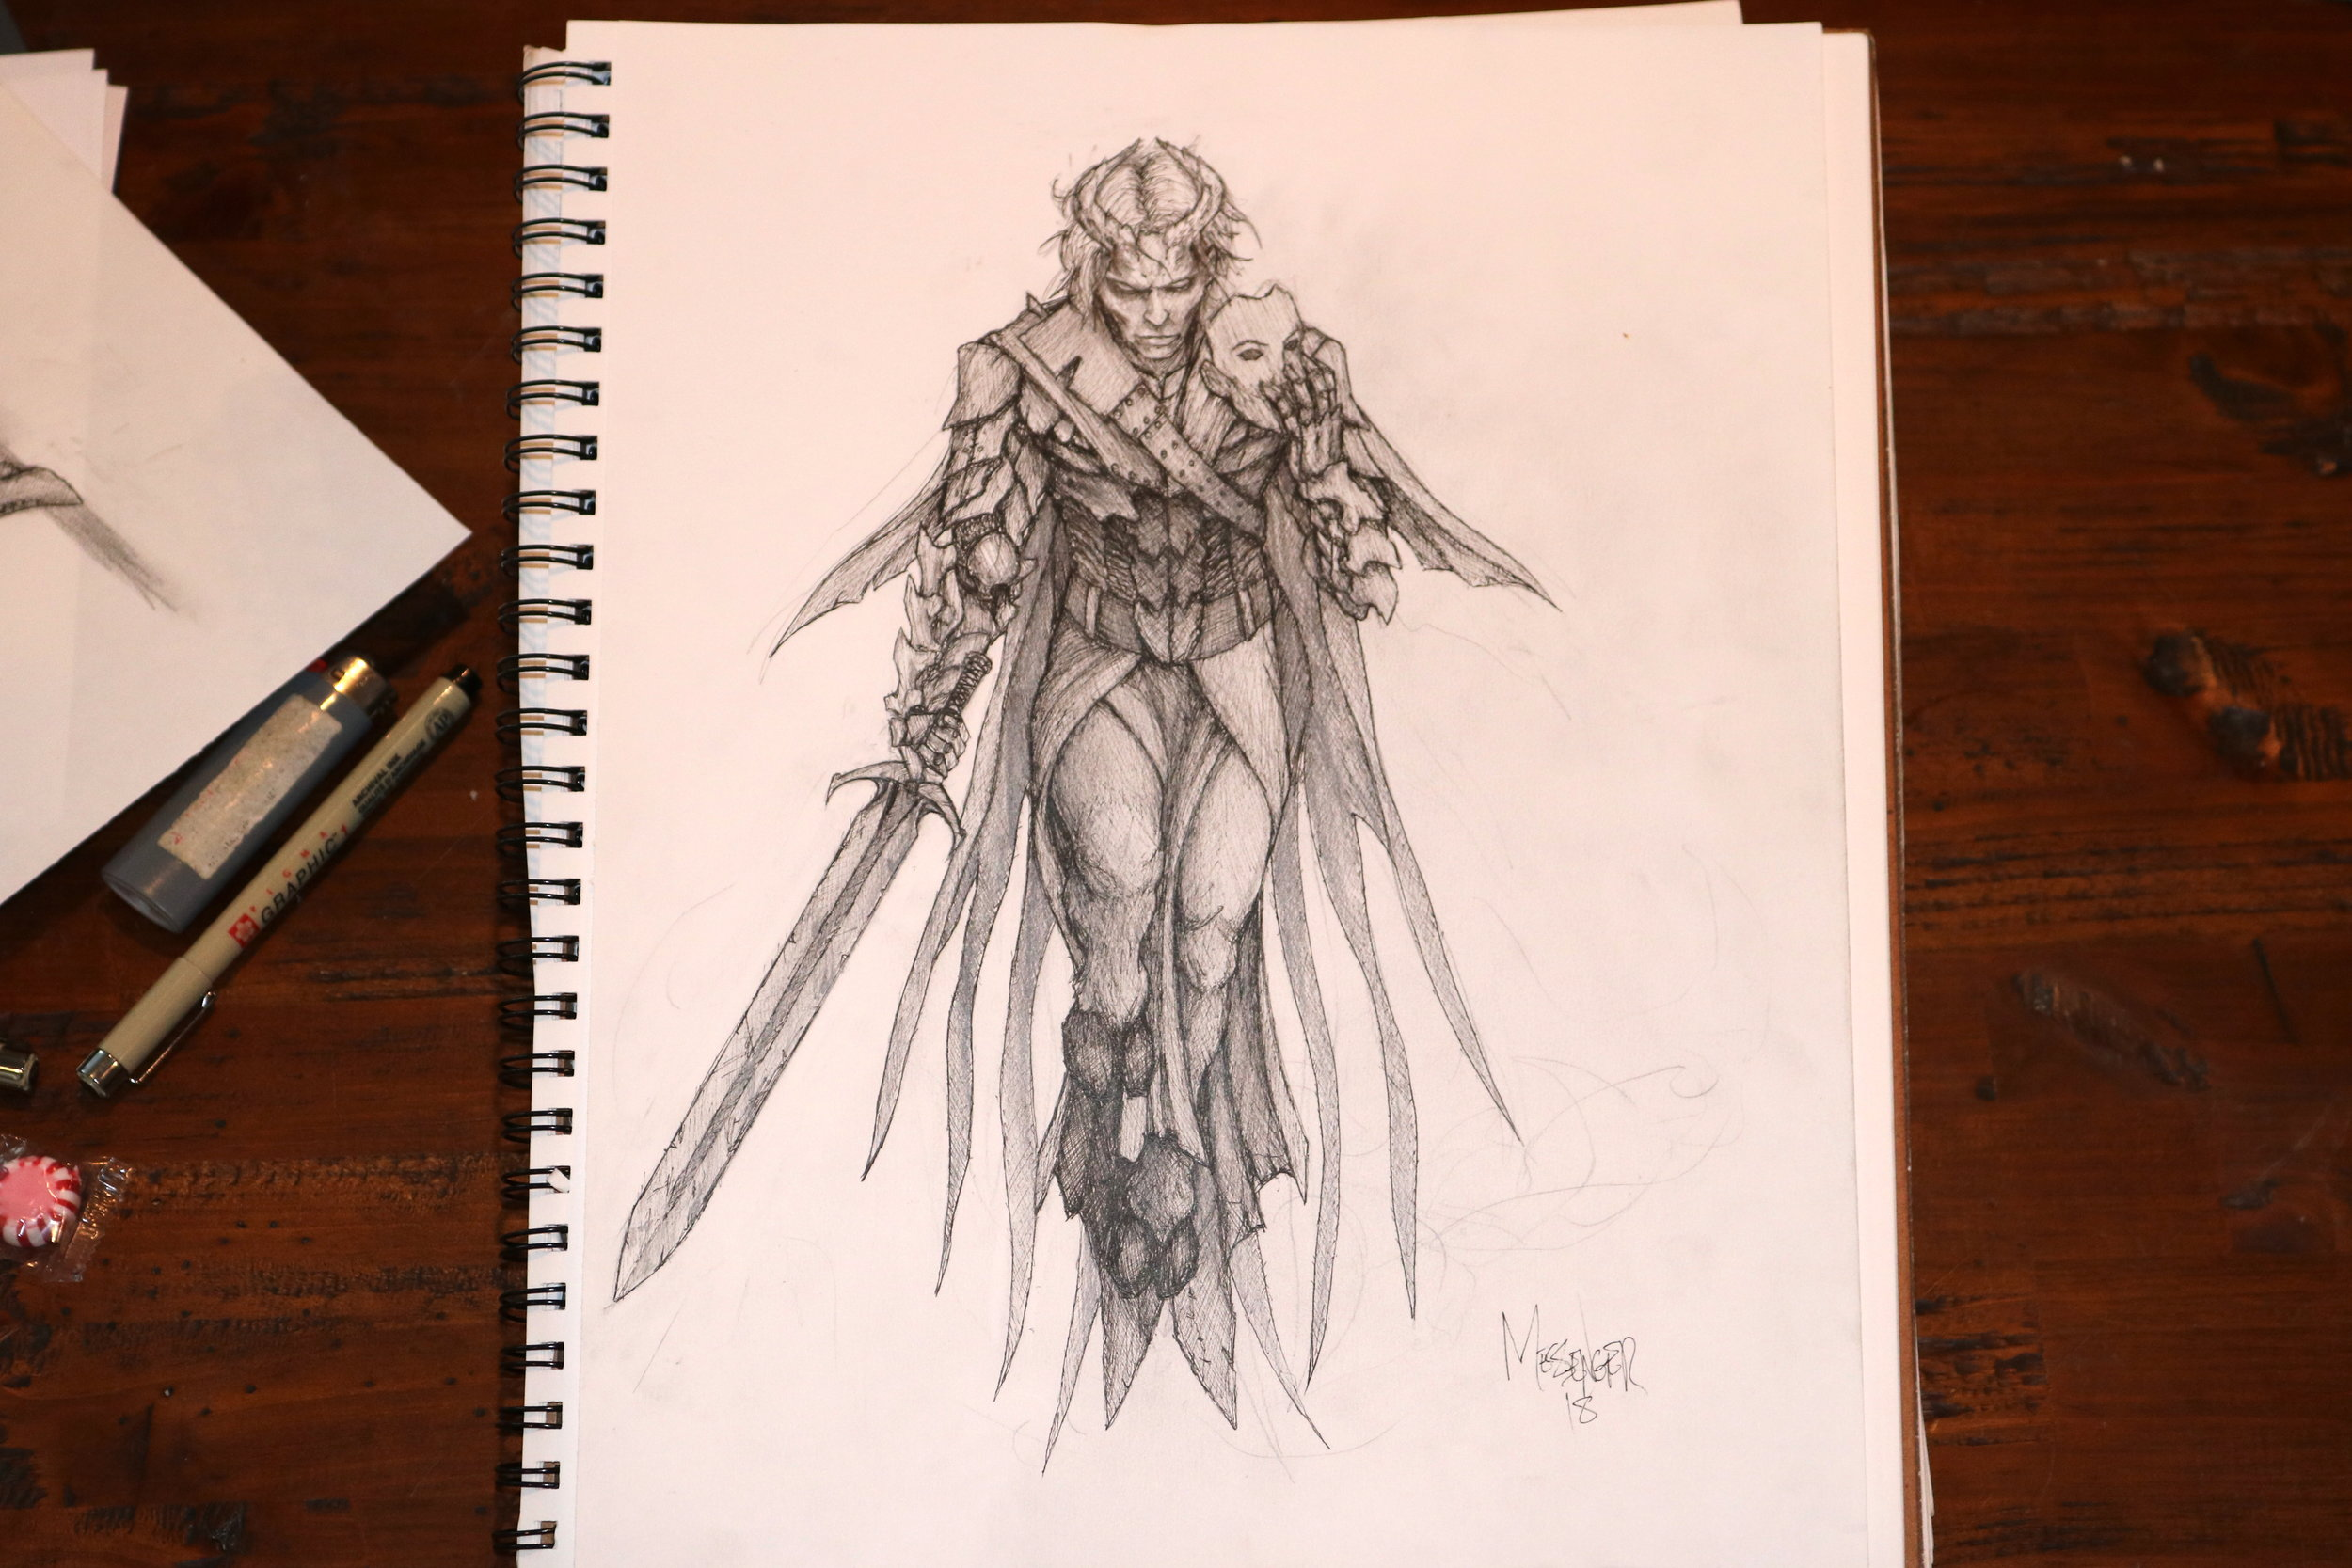 Xaeryn, the changeling, avenger of blood